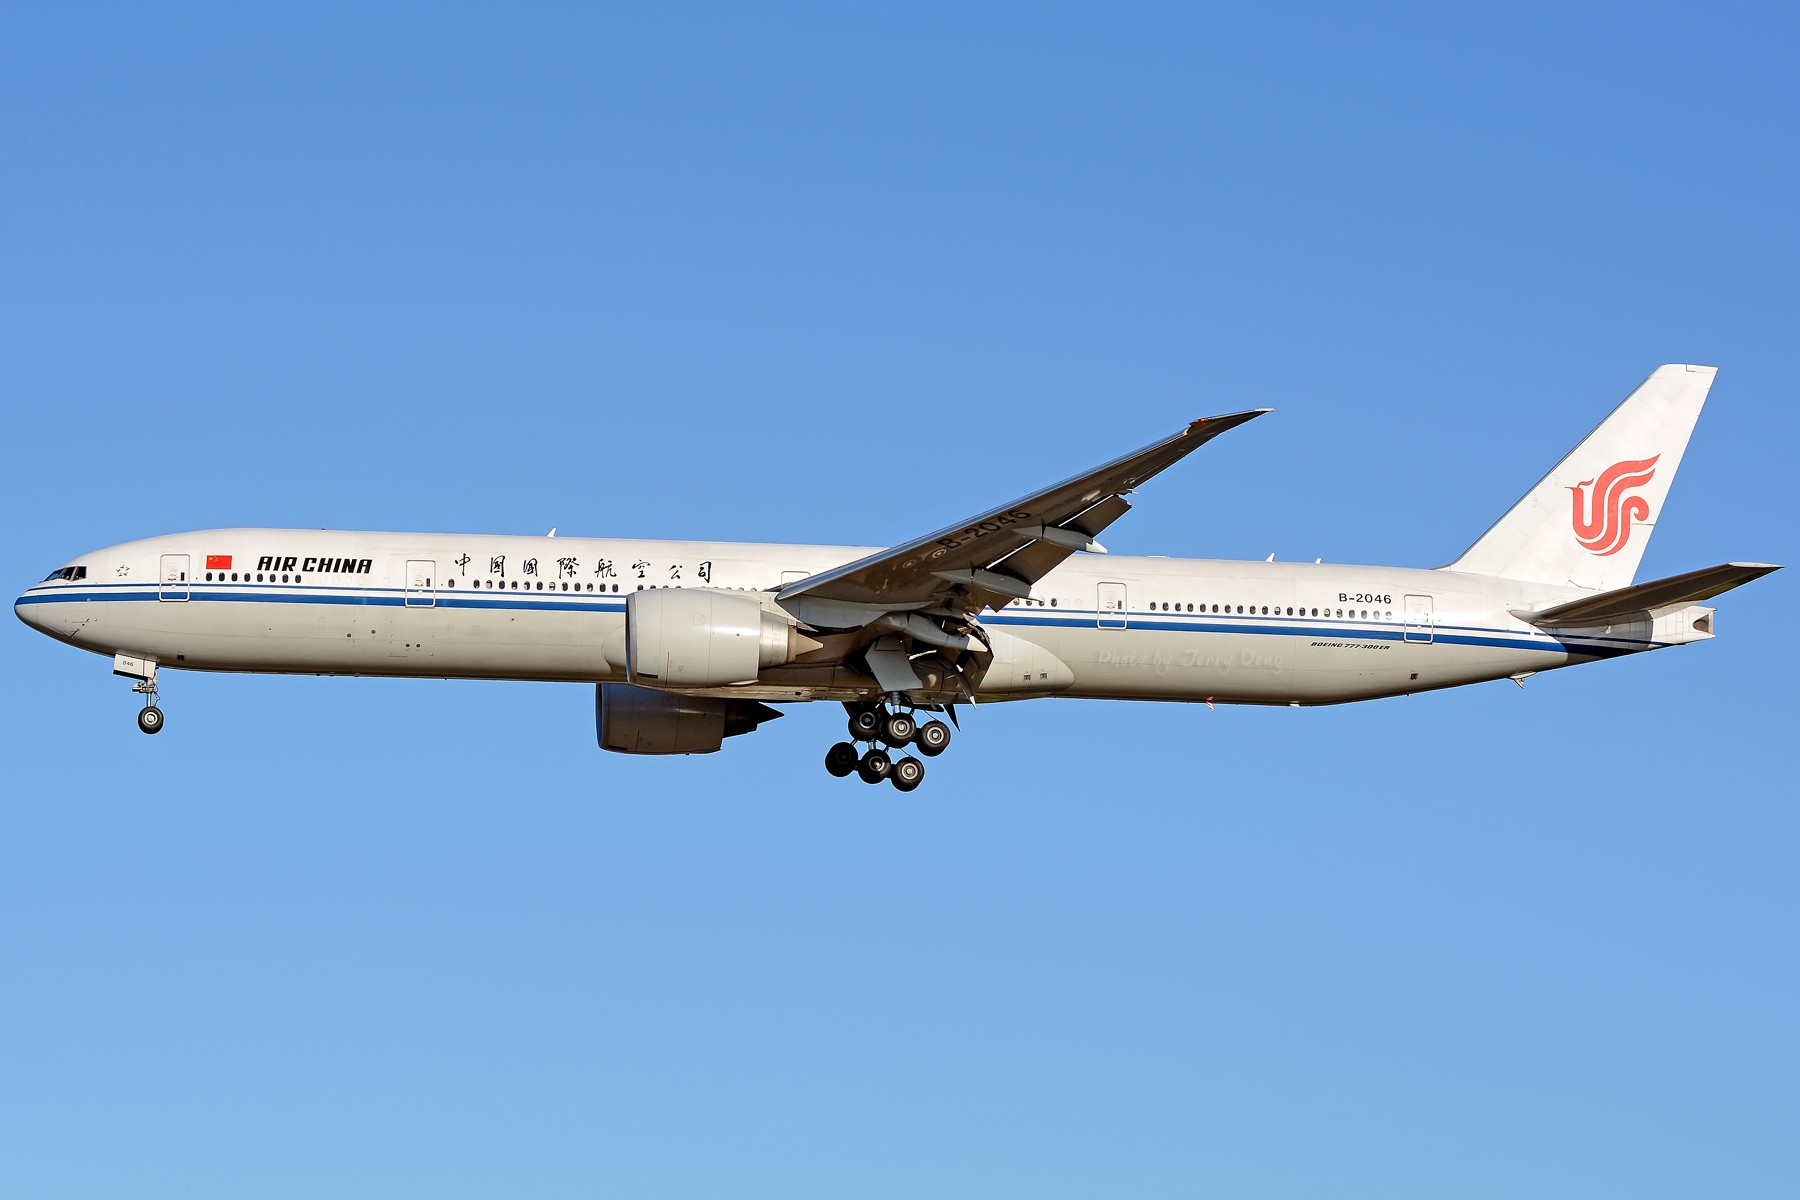 Re:[原创]【多图党】PEK落地一组国航系【2】 BOEING 777-300ER B-2046 中国北京首都国际机场